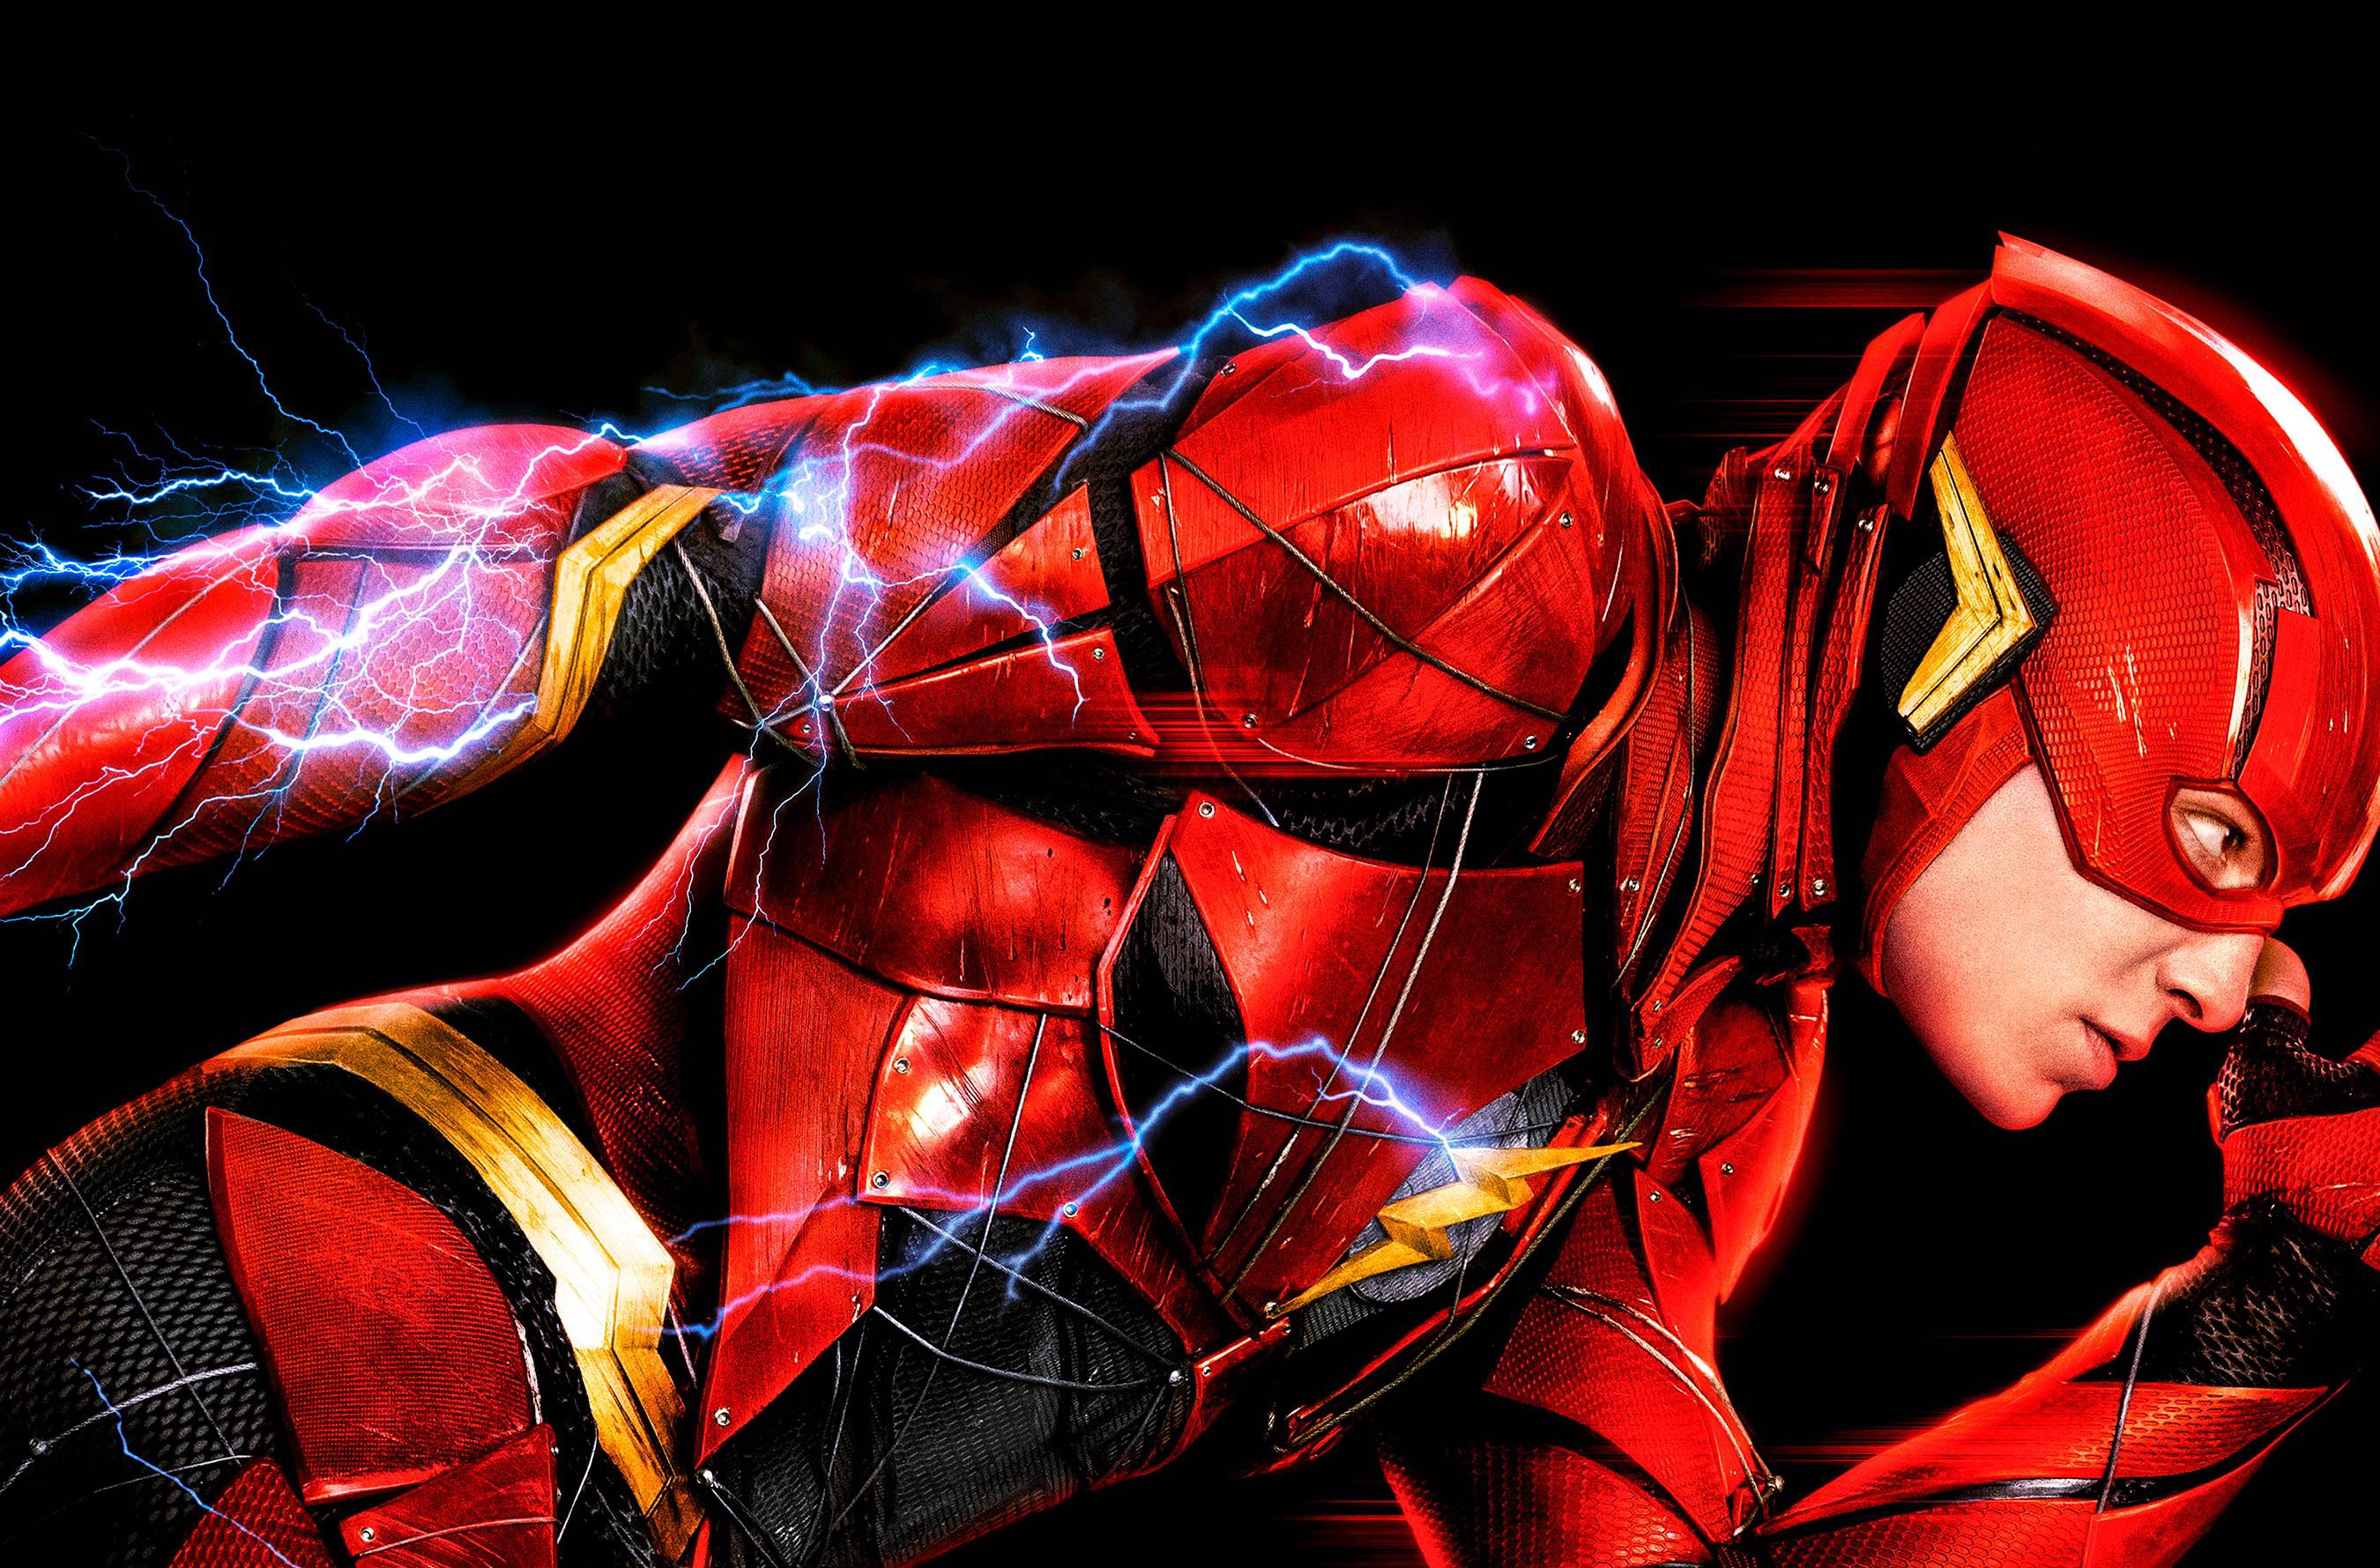 Wallpaper Justice League 2017 Movies Flash Superman: Flash Justice League 2017, HD Movies, 4k Wallpapers